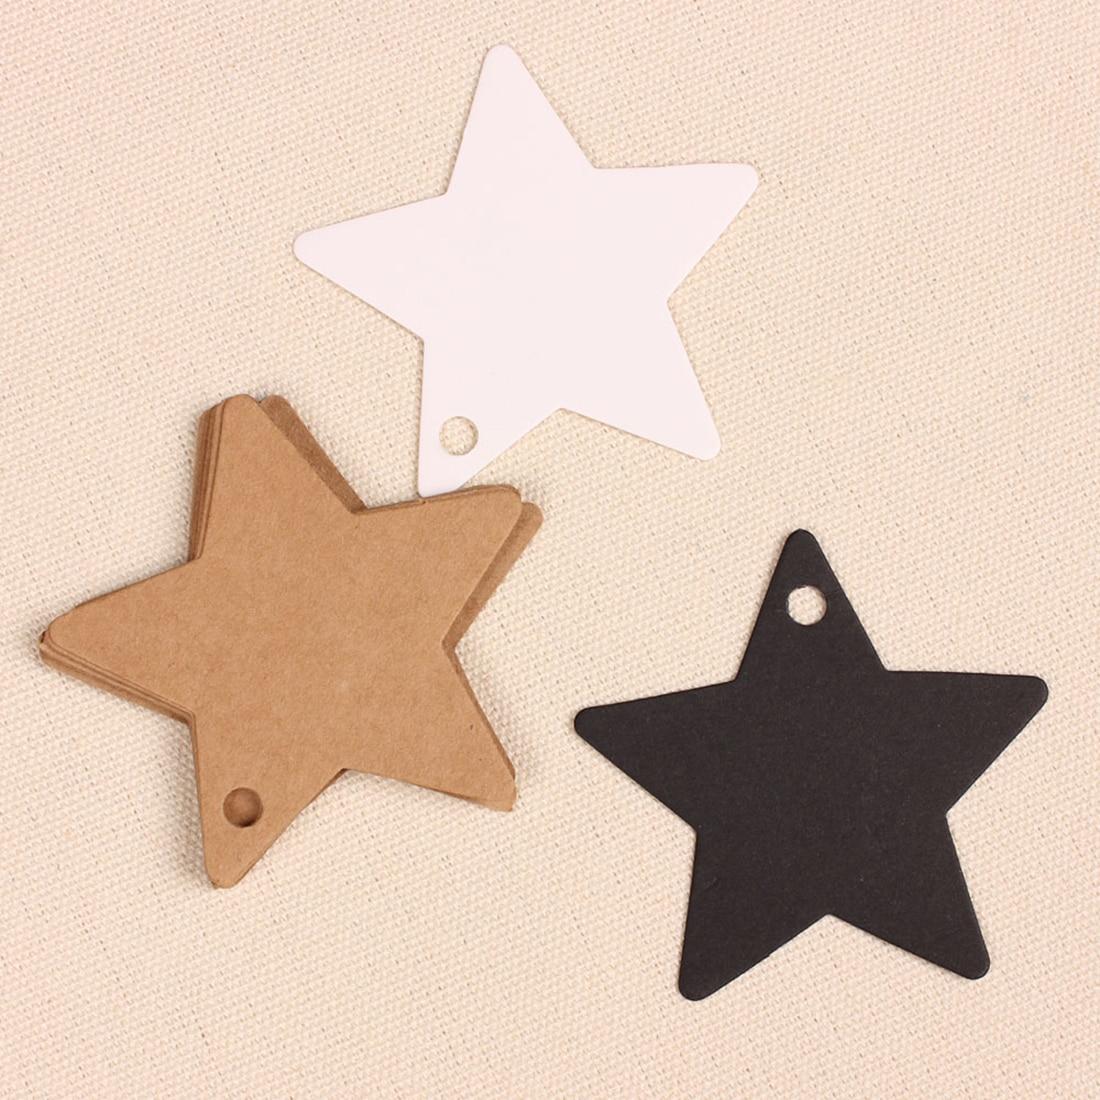 10Pcs/set Star Blank Kraft Paper Gift Tags Wedding Doorplate Scallop Favour Luggage